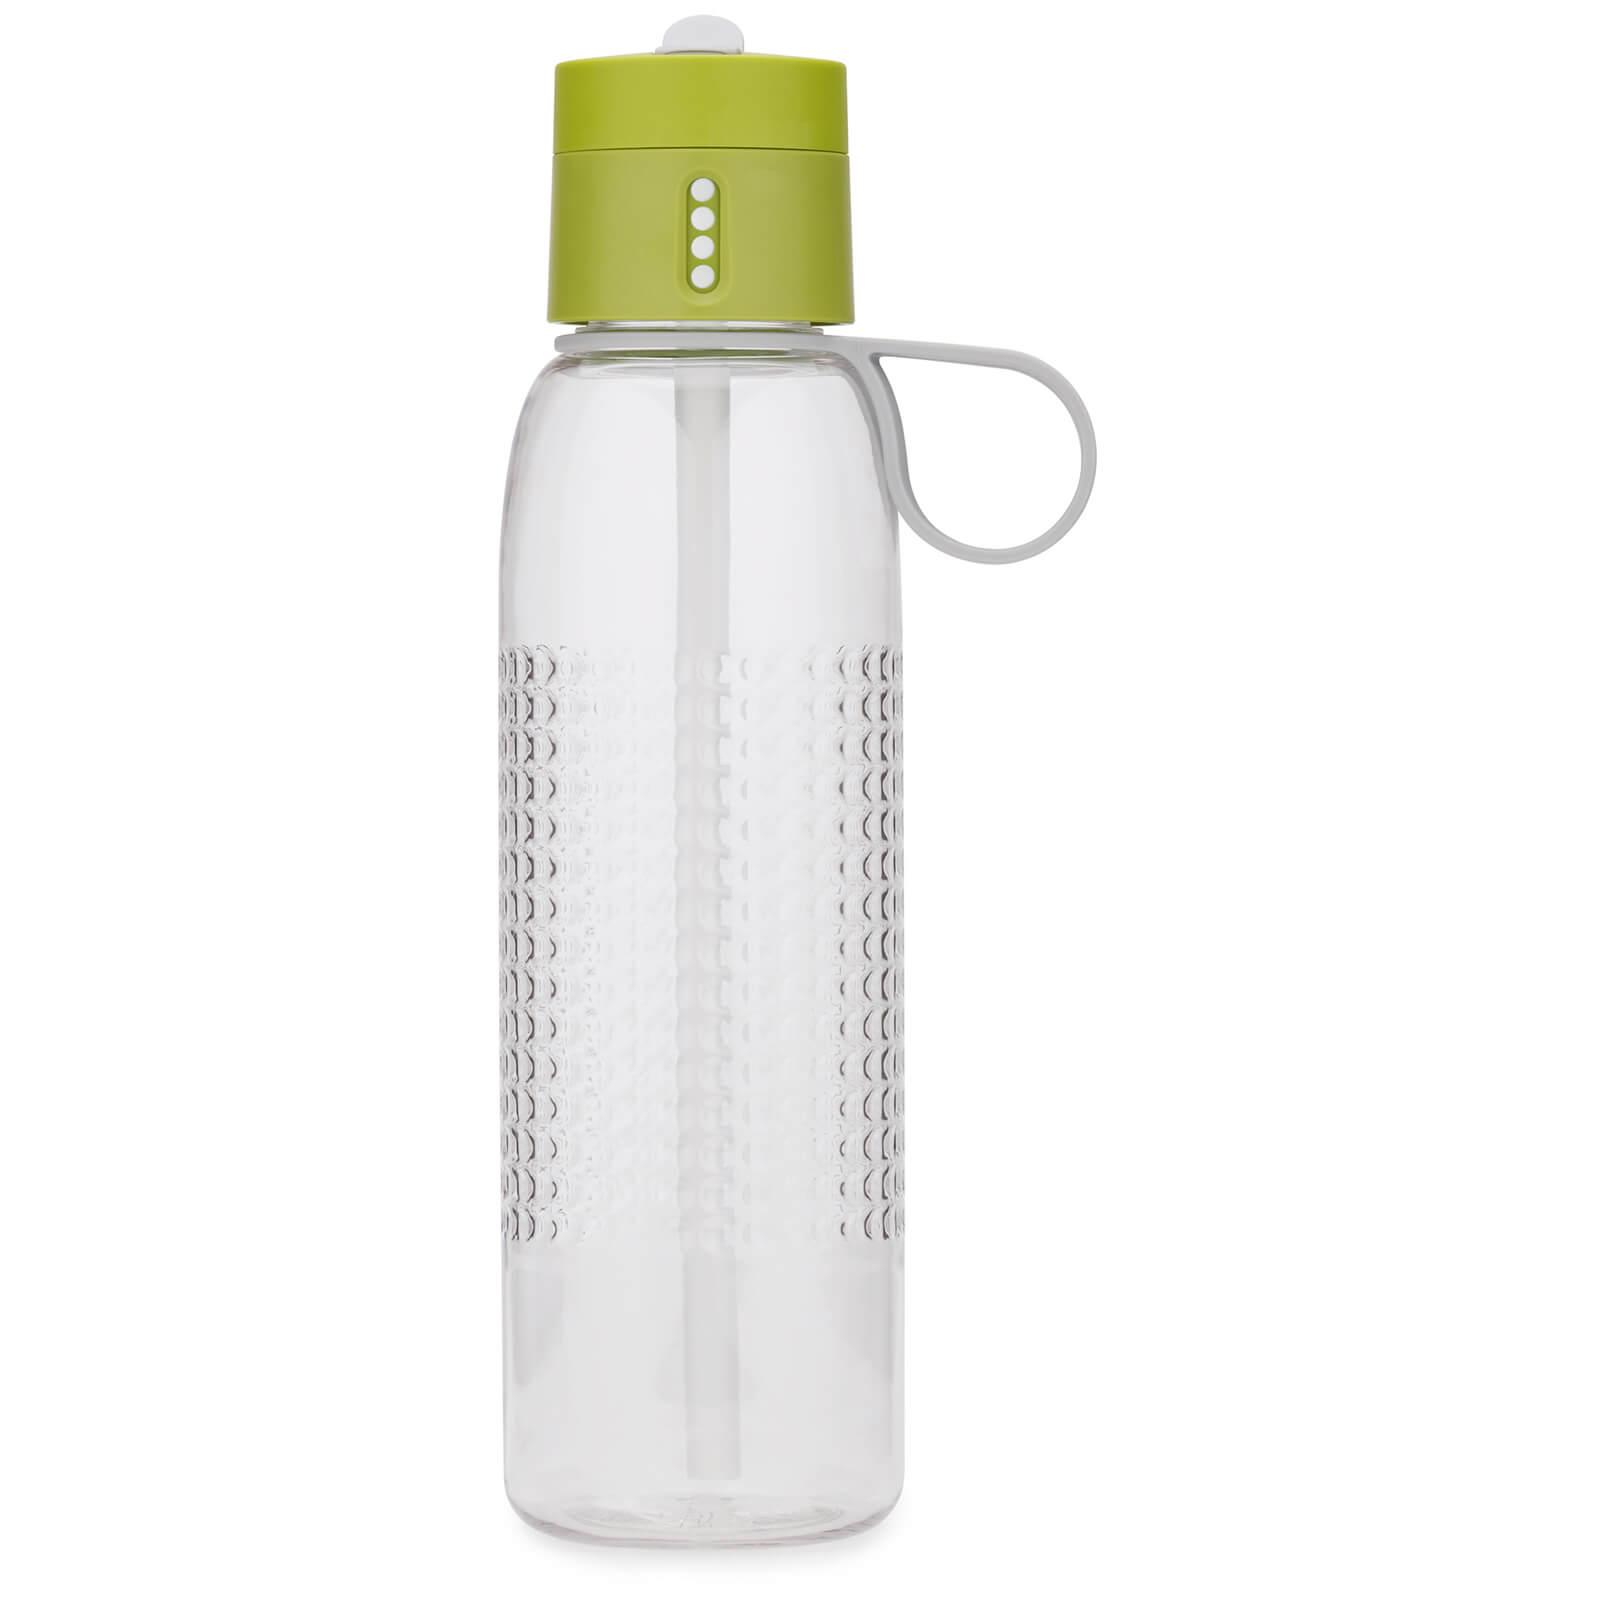 Joseph Joseph Dot Active Water Bottle - 750ml - Green